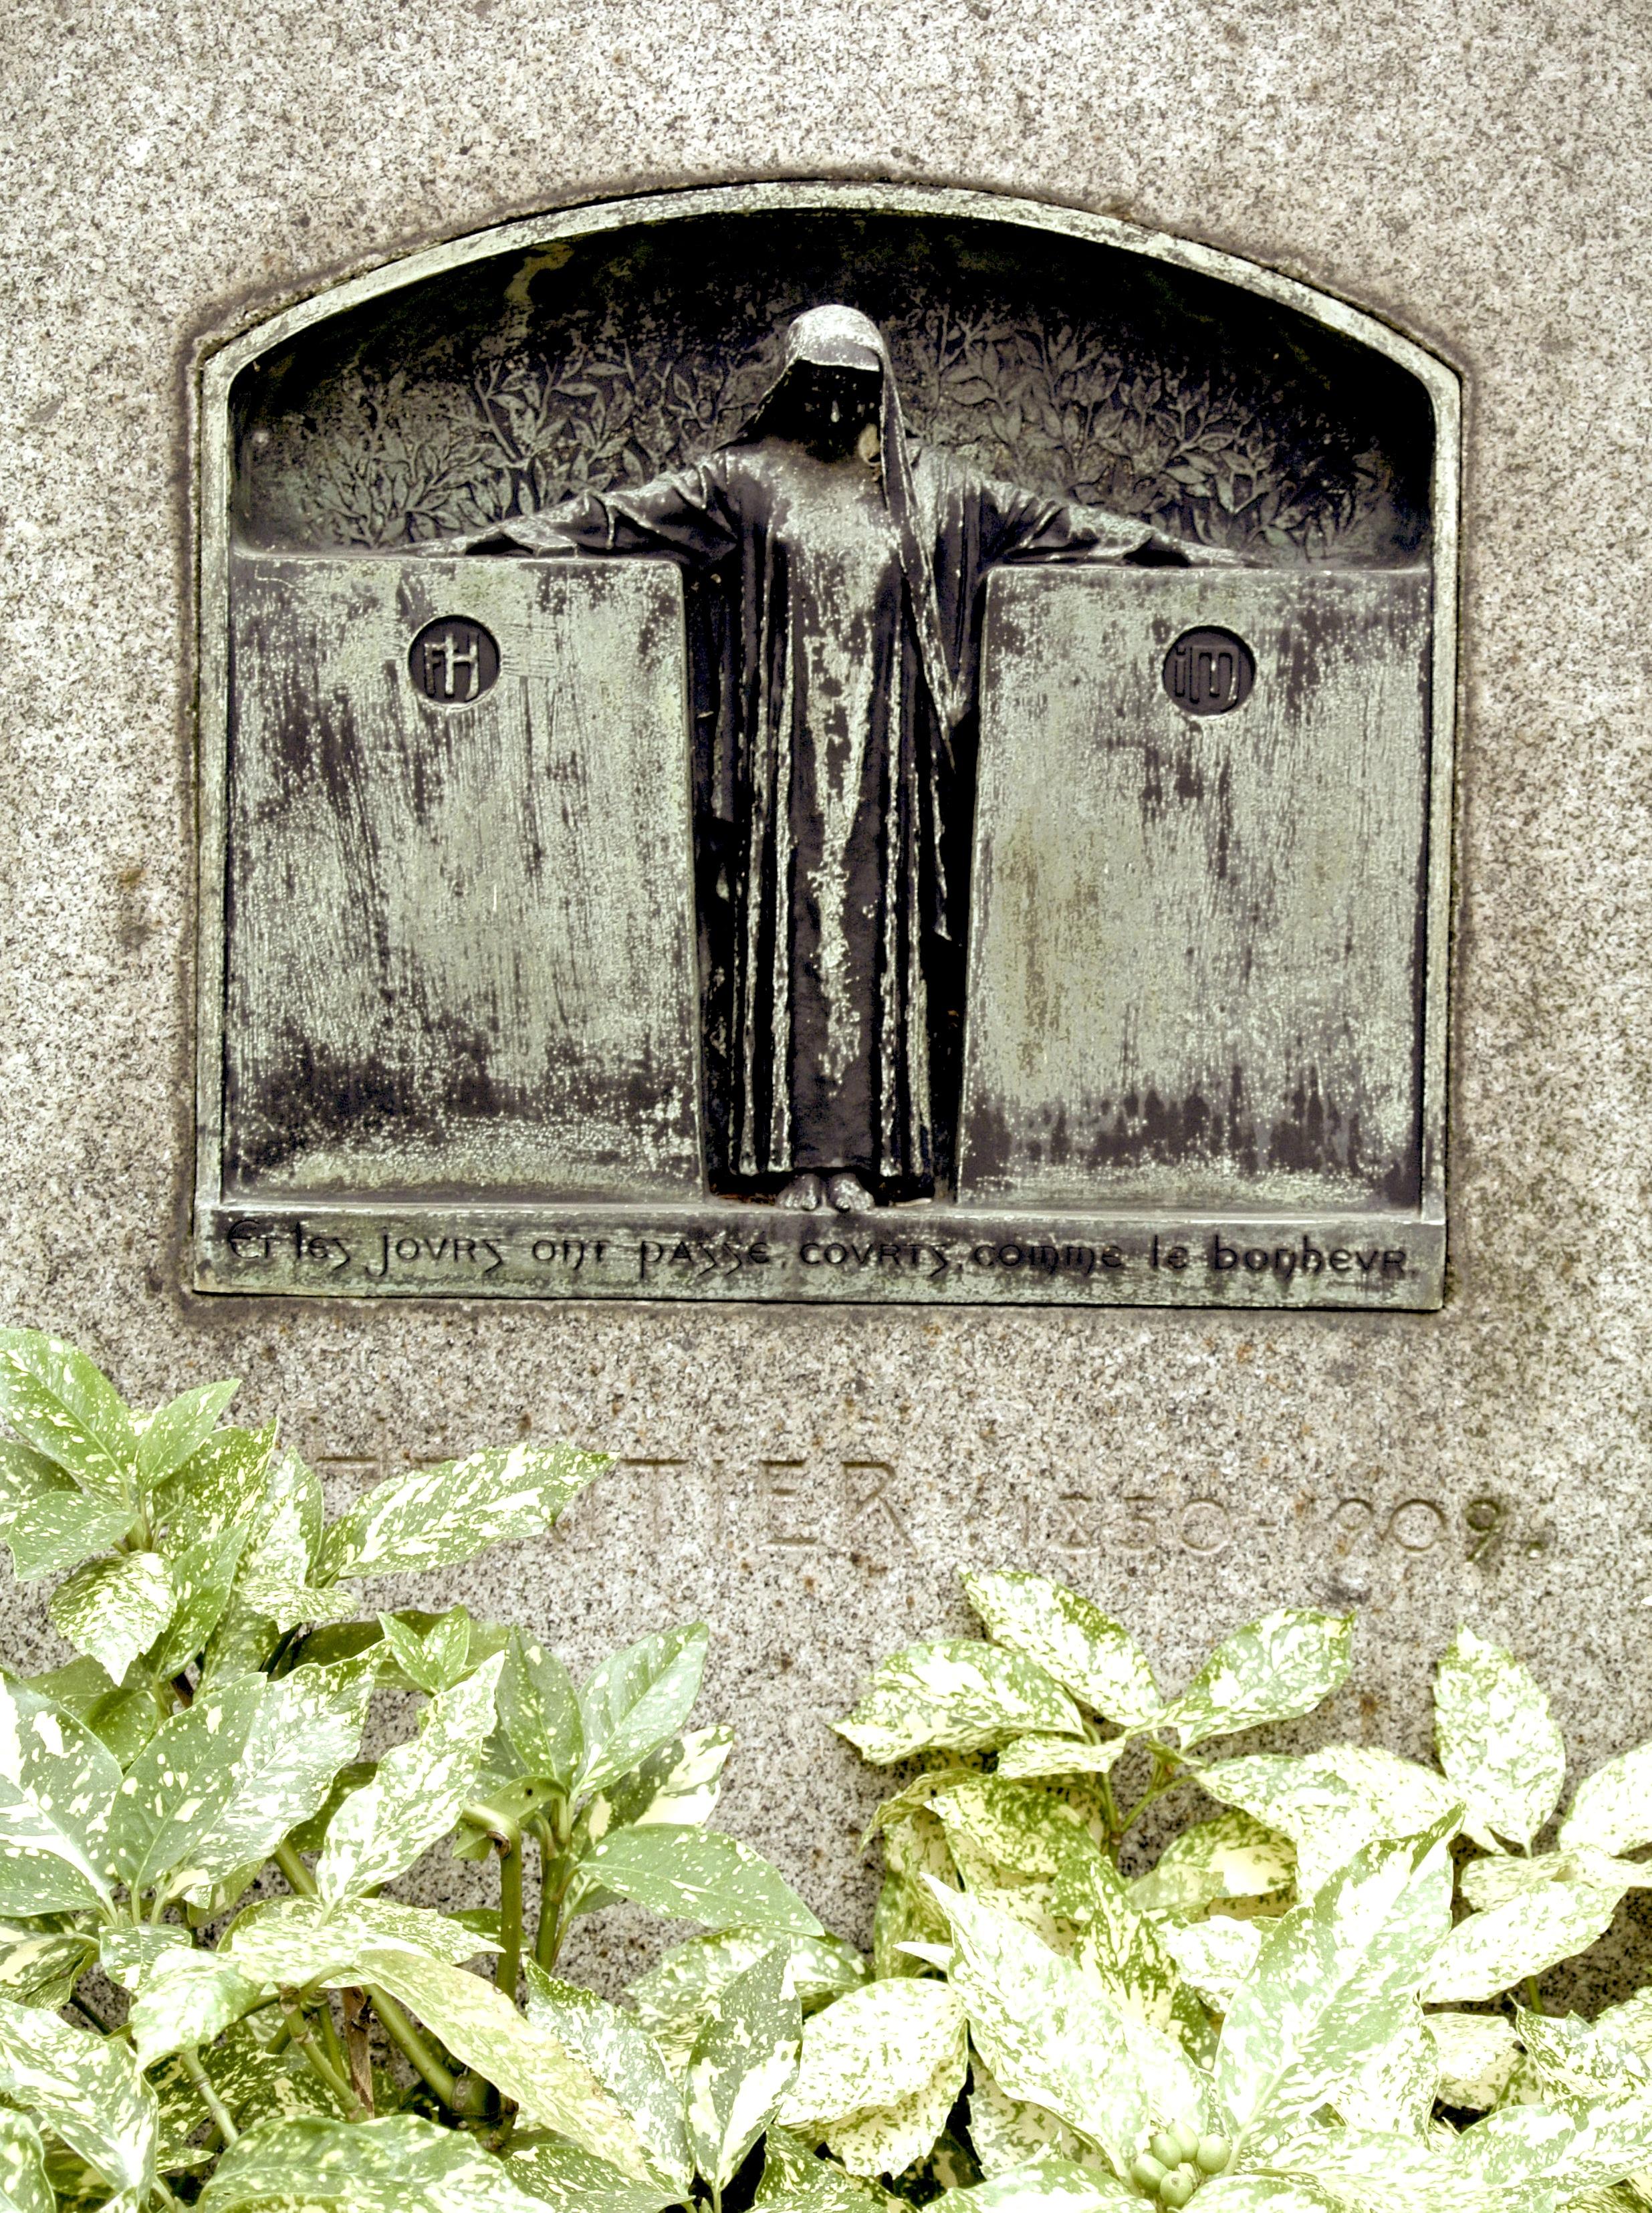 gravedetail.JPG